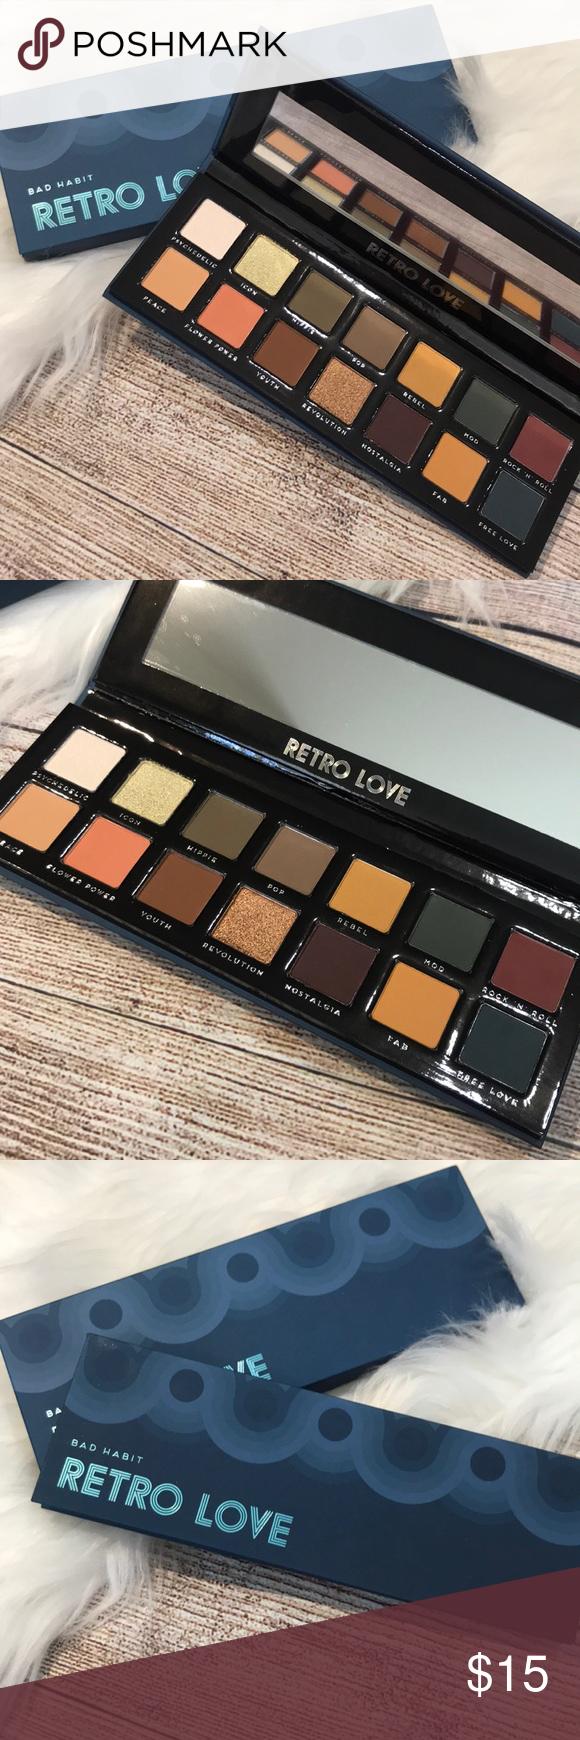 Bad Habit Retro Love eyeshadow palette NEW Retro